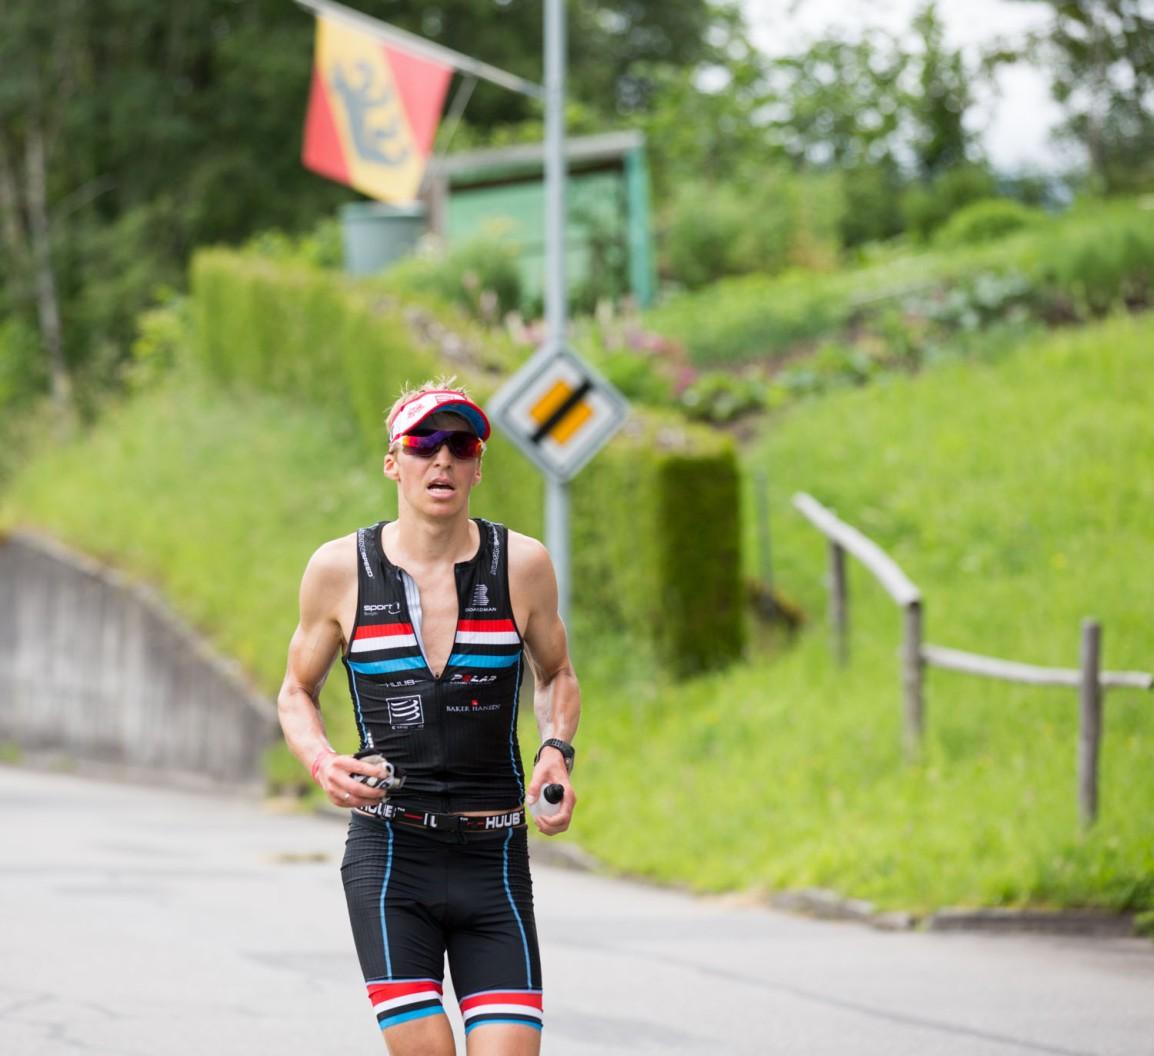 Swissman Xtreme triathlon - Triallan - Allan Hovda - Boardman TTE - Castelli Gabba - Swiss Alps-12